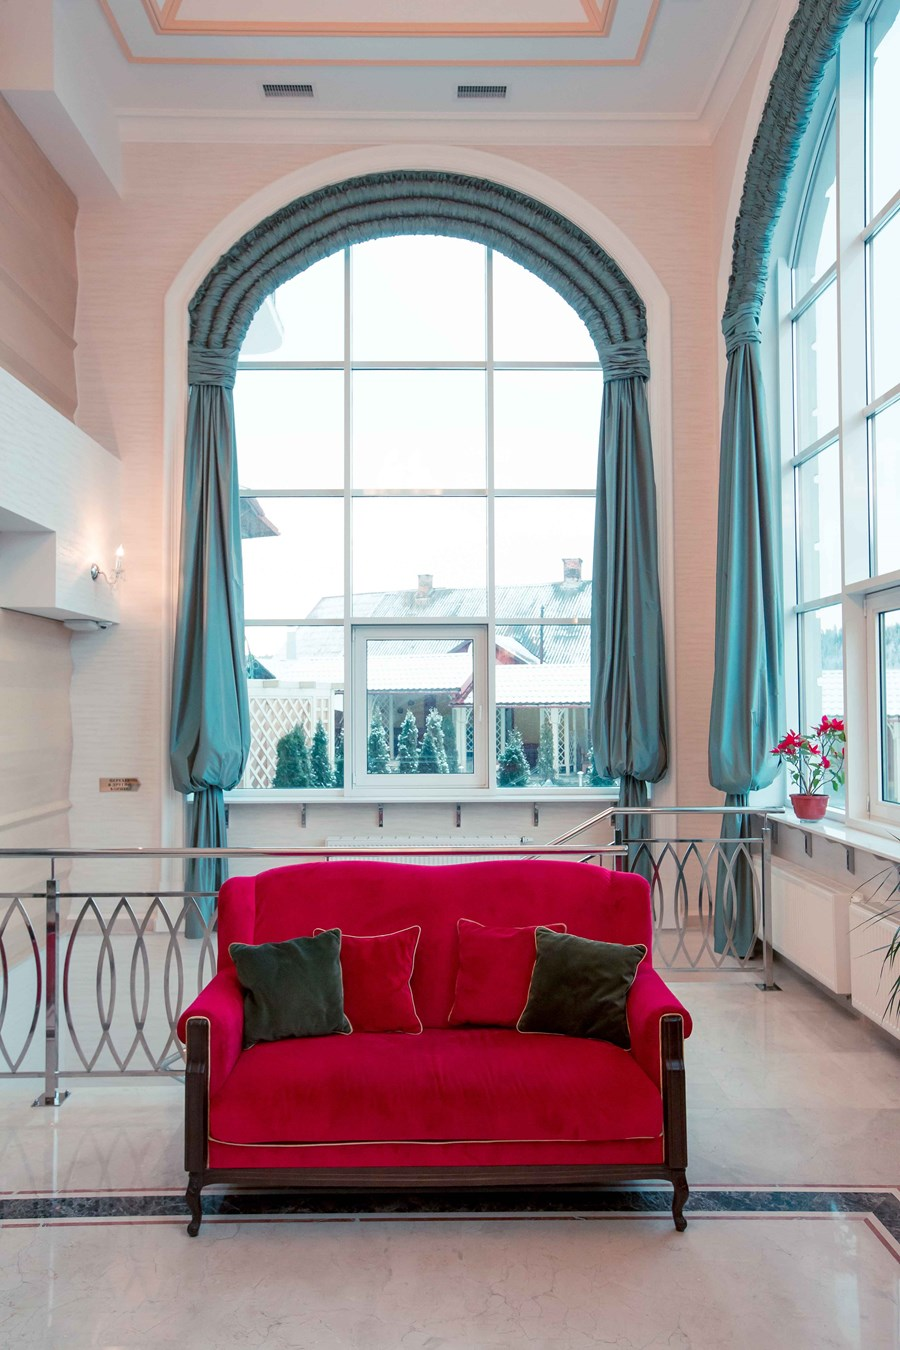 Modern Hotel by Cult of Design 07